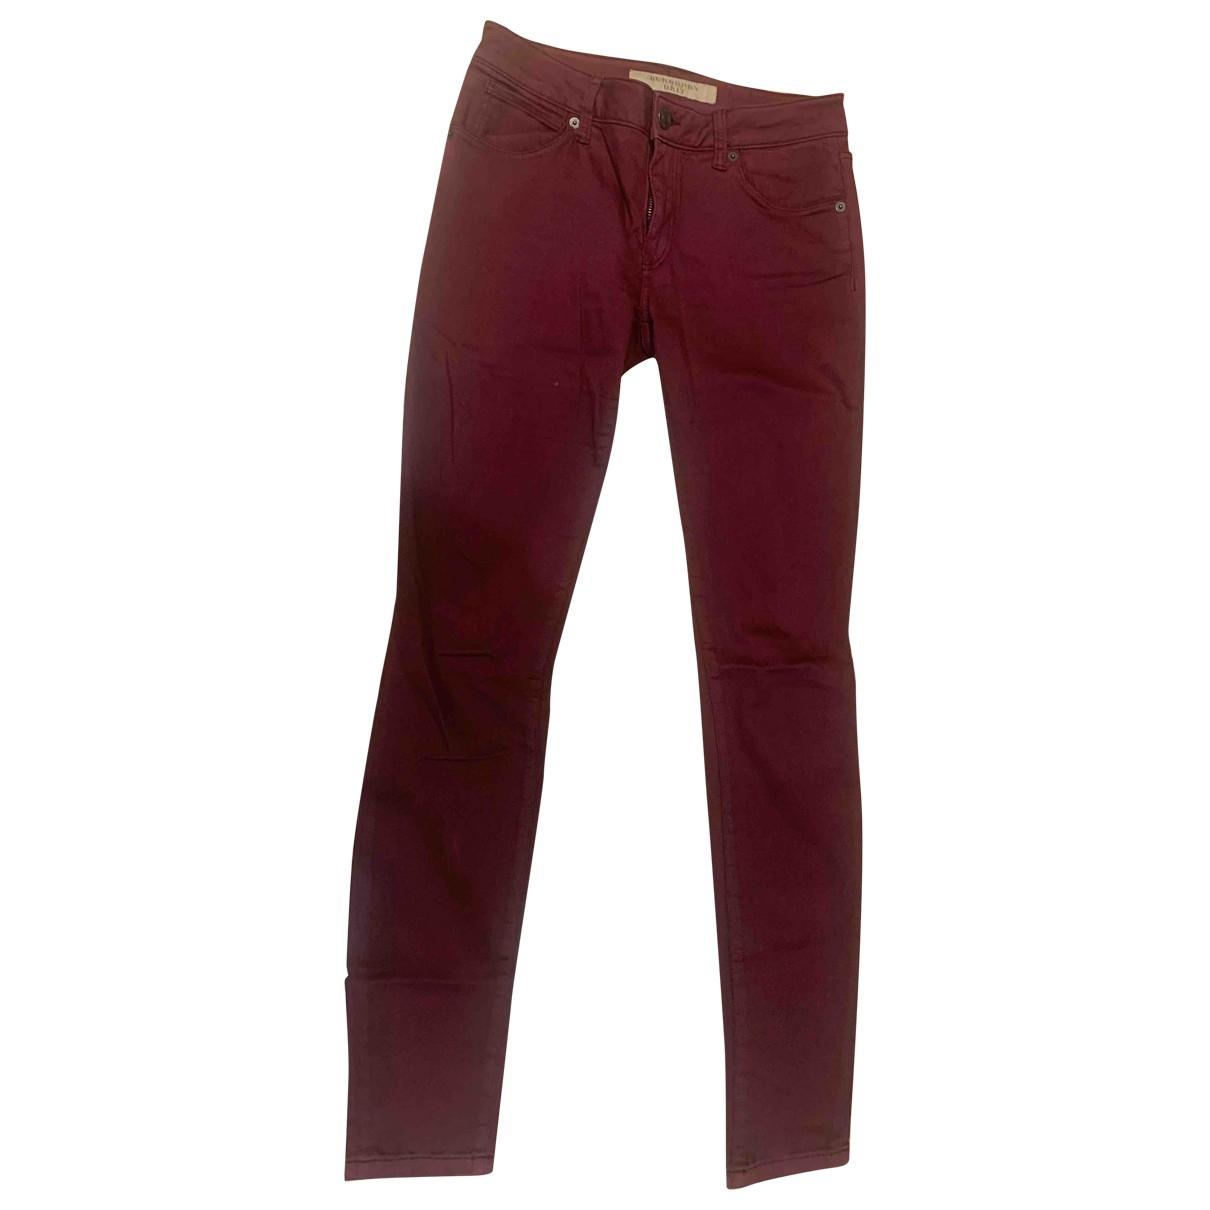 Burberry \N Burgundy Cotton - elasthane Jeans for Women 27 US